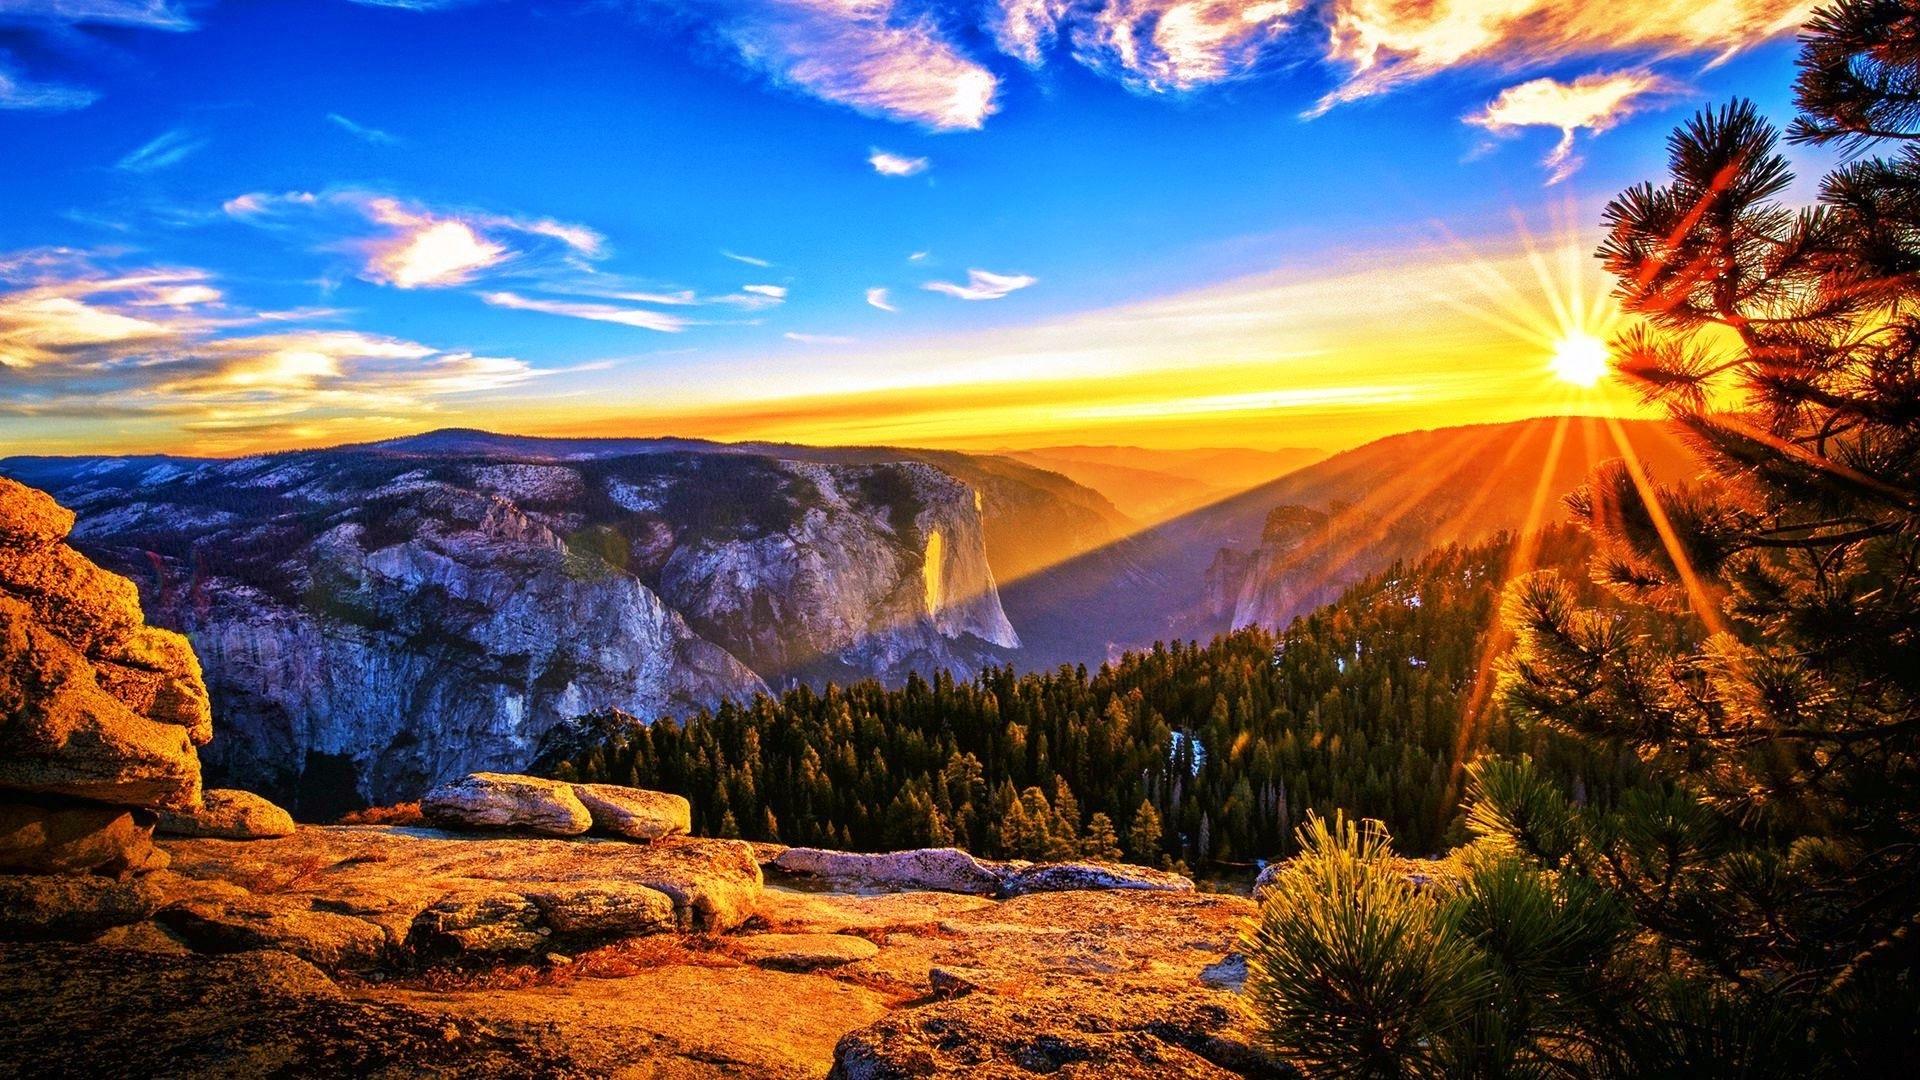 Great Wallpaper Mountain Computer - landscape-nature-wilderness-mountain-light-sky-sunrise-sunset-sunlight-morning-dawn-dusk-scenic-autumn-blue-outdoors-clouds-mountains-plateau-computer-wallpaper-678538  Image_307056.jpg